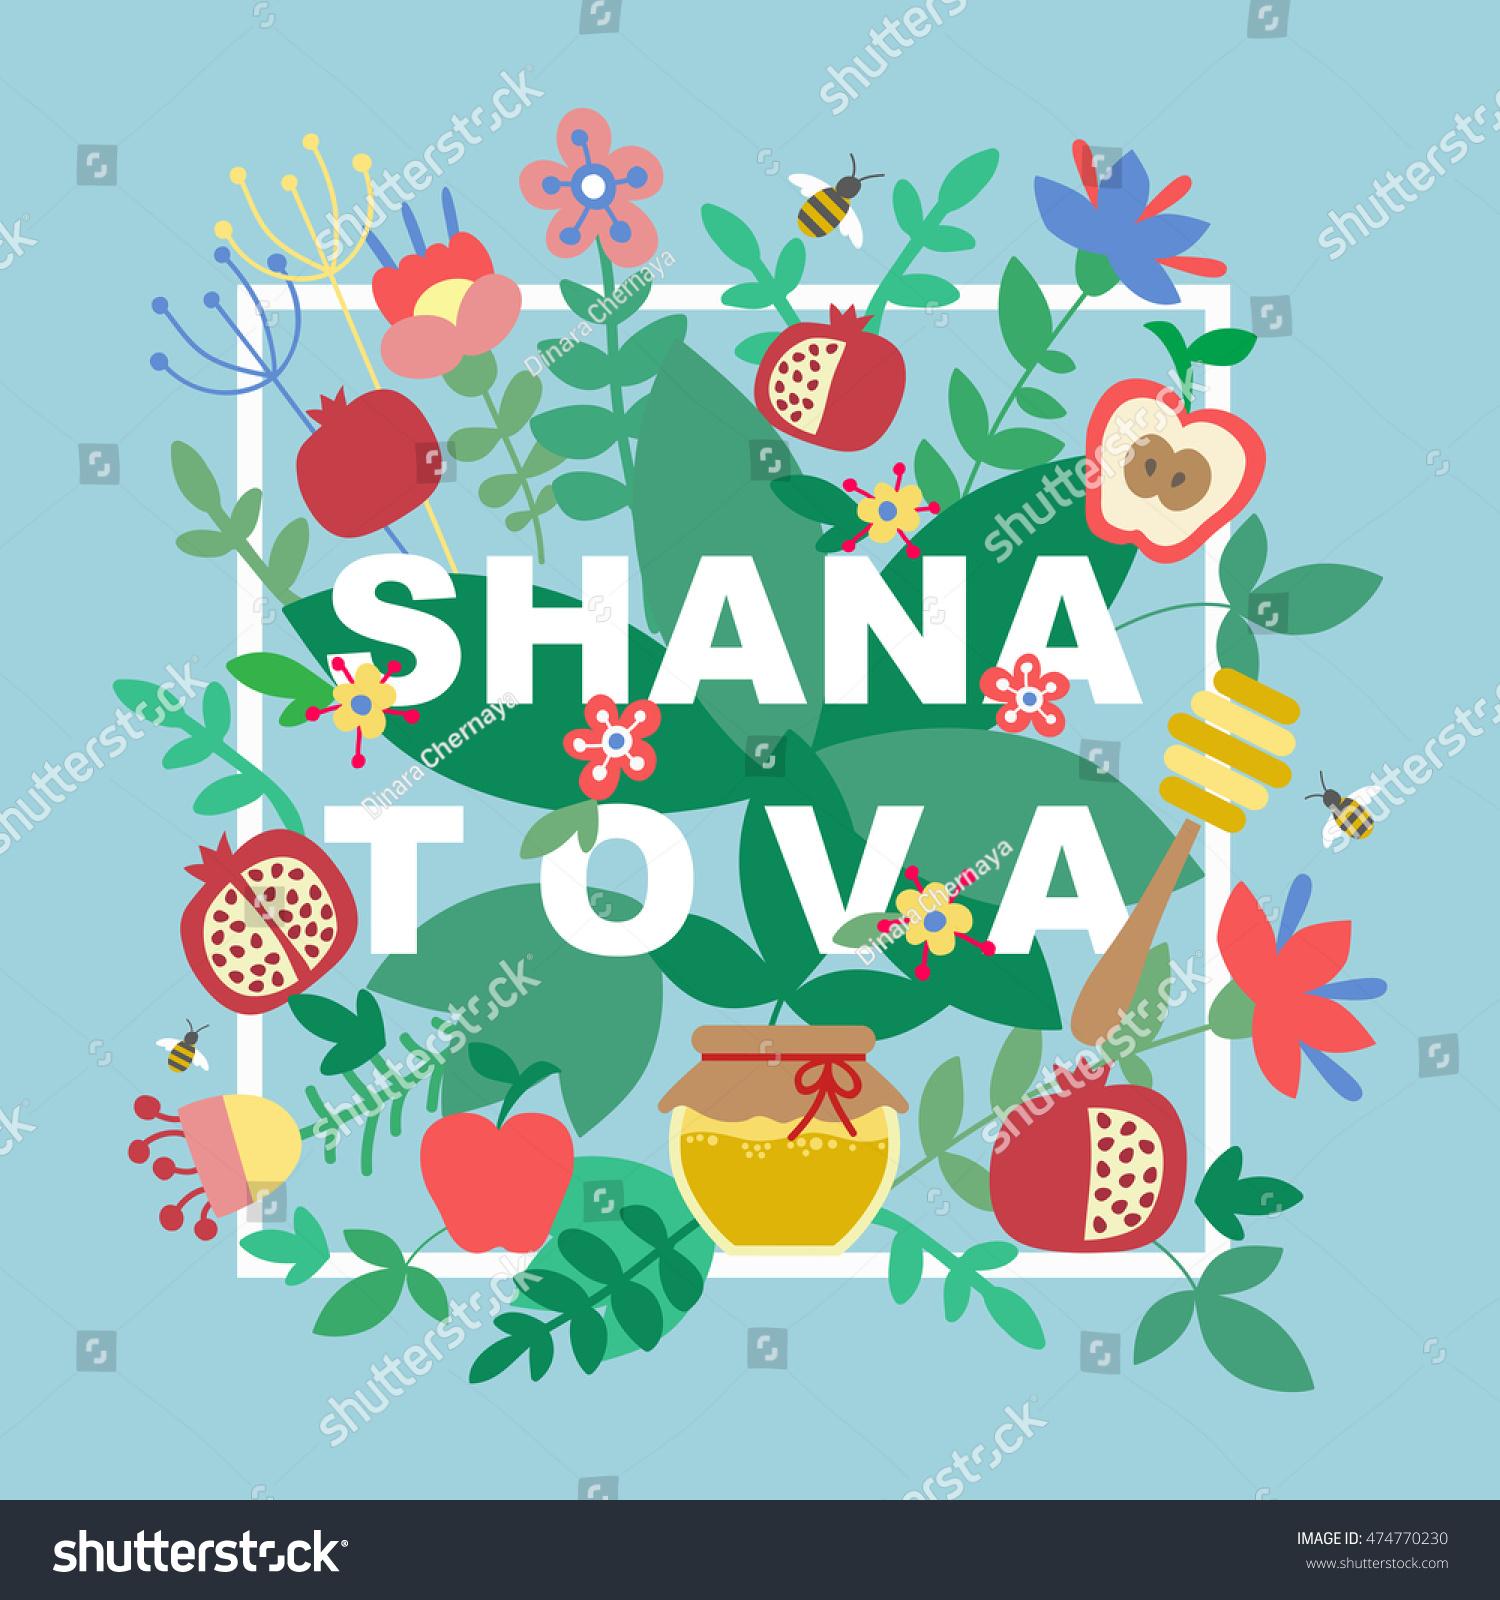 Shana tova happy new year on stock vector royalty free 474770230 greeting card for jewish m4hsunfo